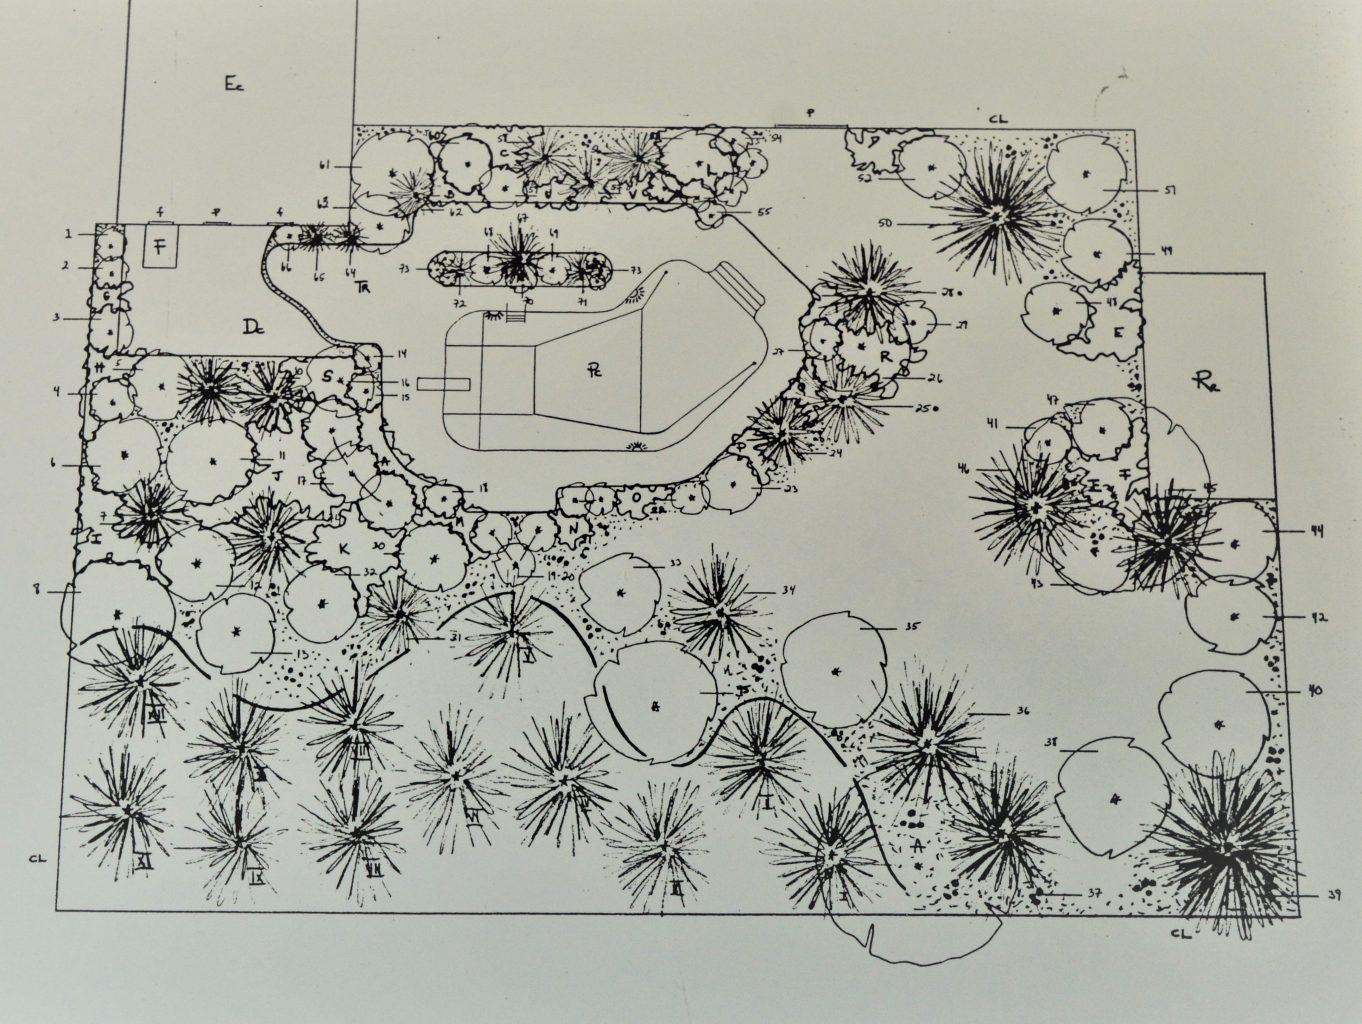 Plani-Décor-Aménagement paysager-Plan 8